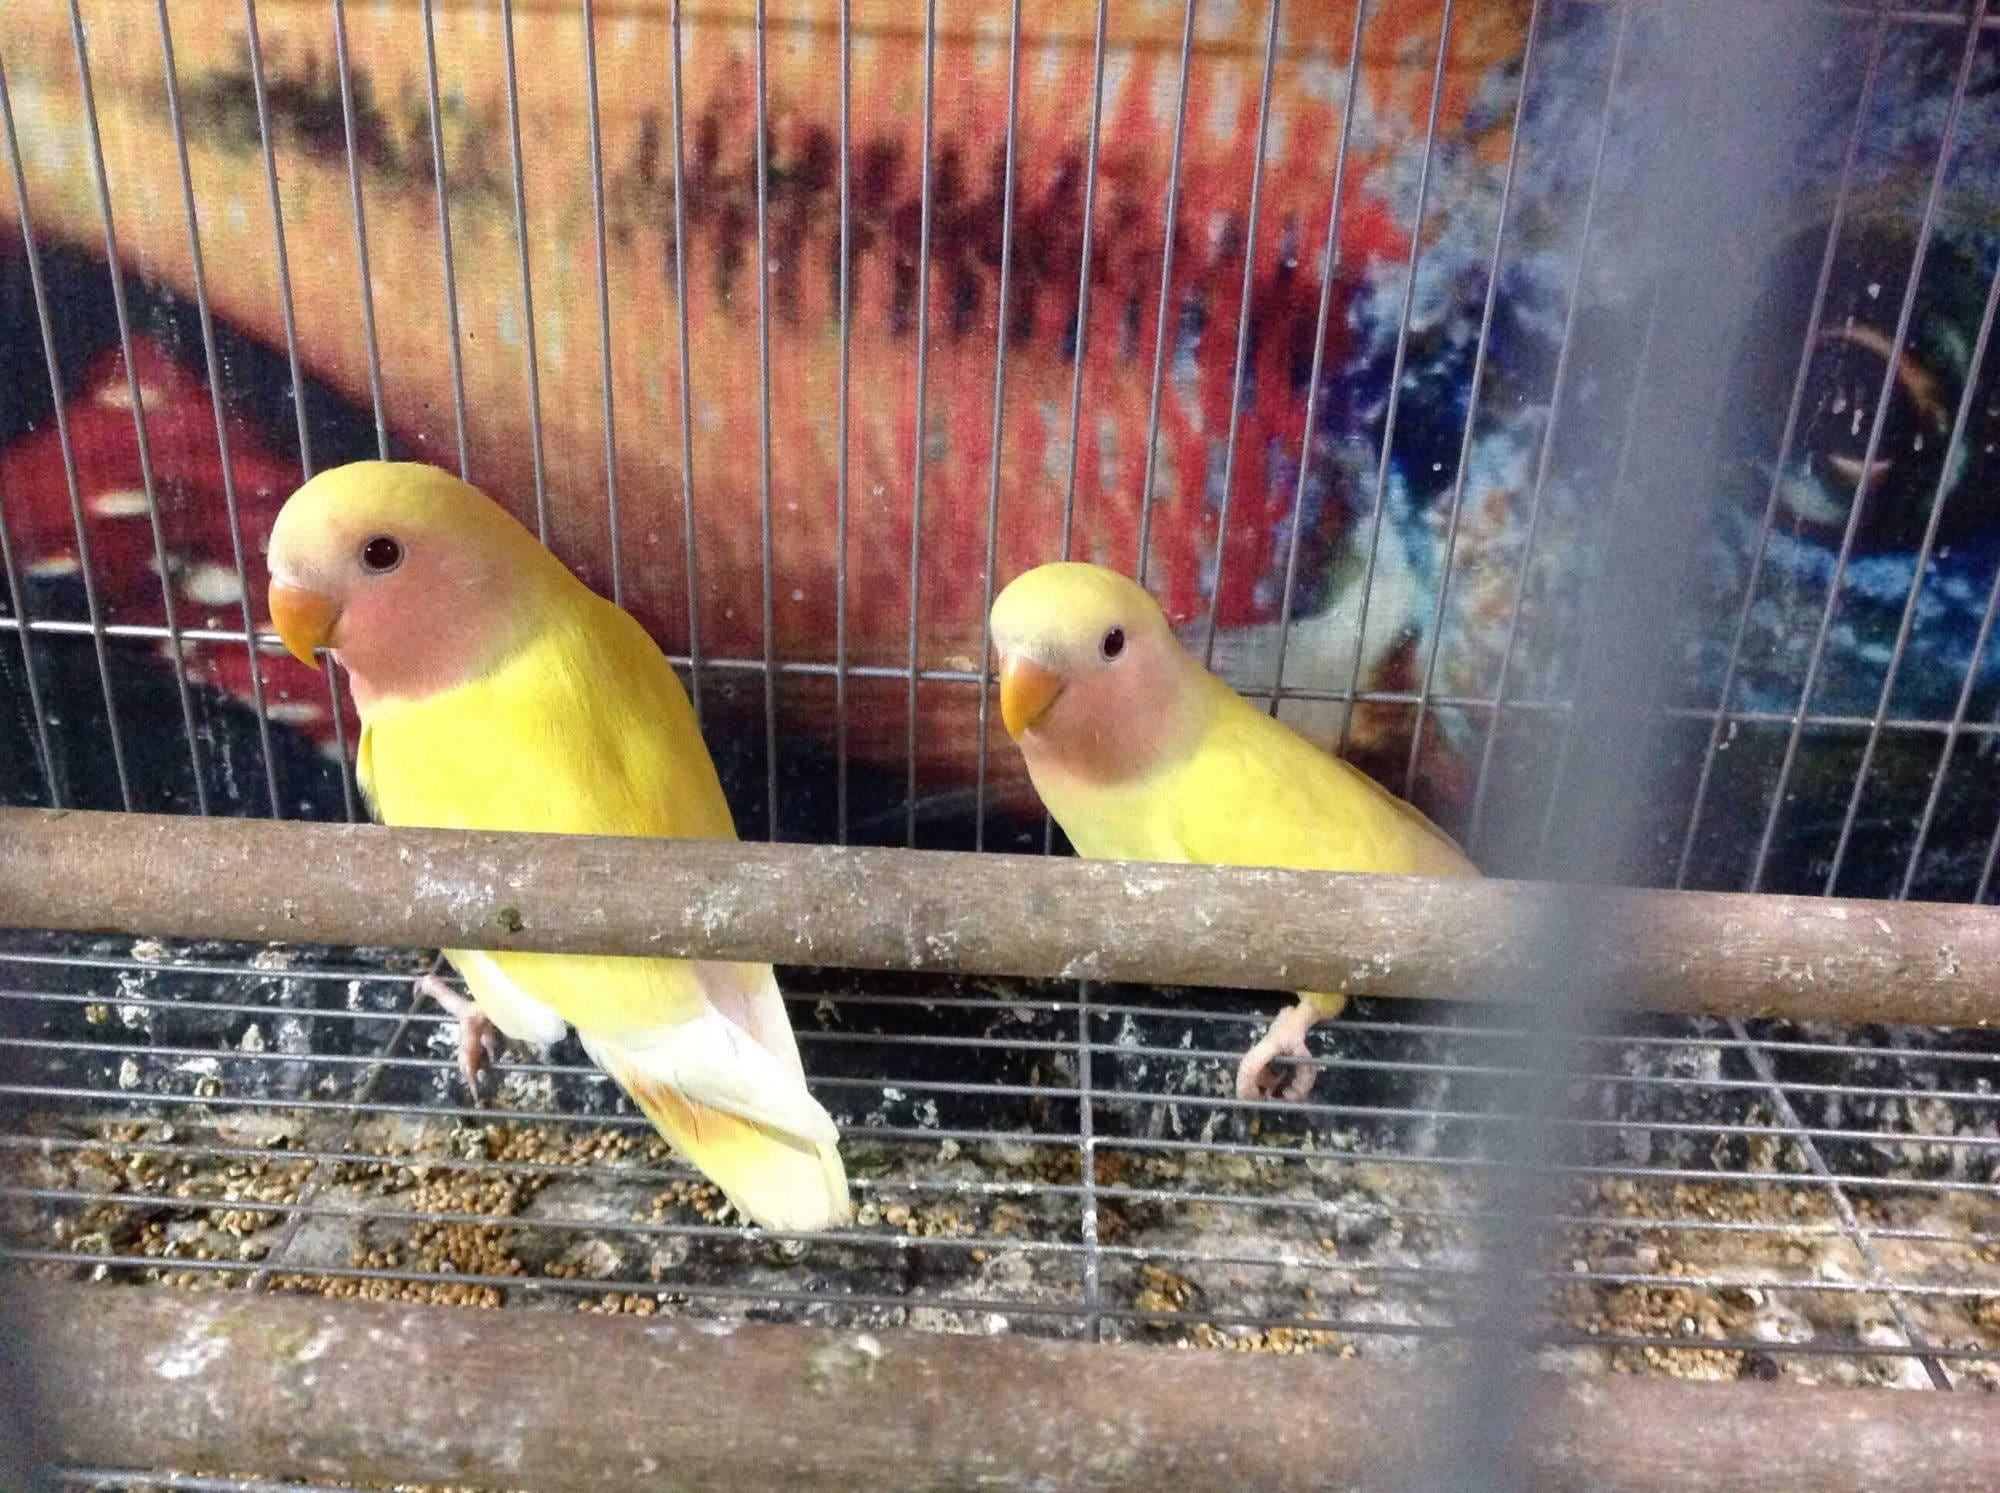 Top 50 Pet Shops For Birds in Nashik - Best Bird Shops - Justdial